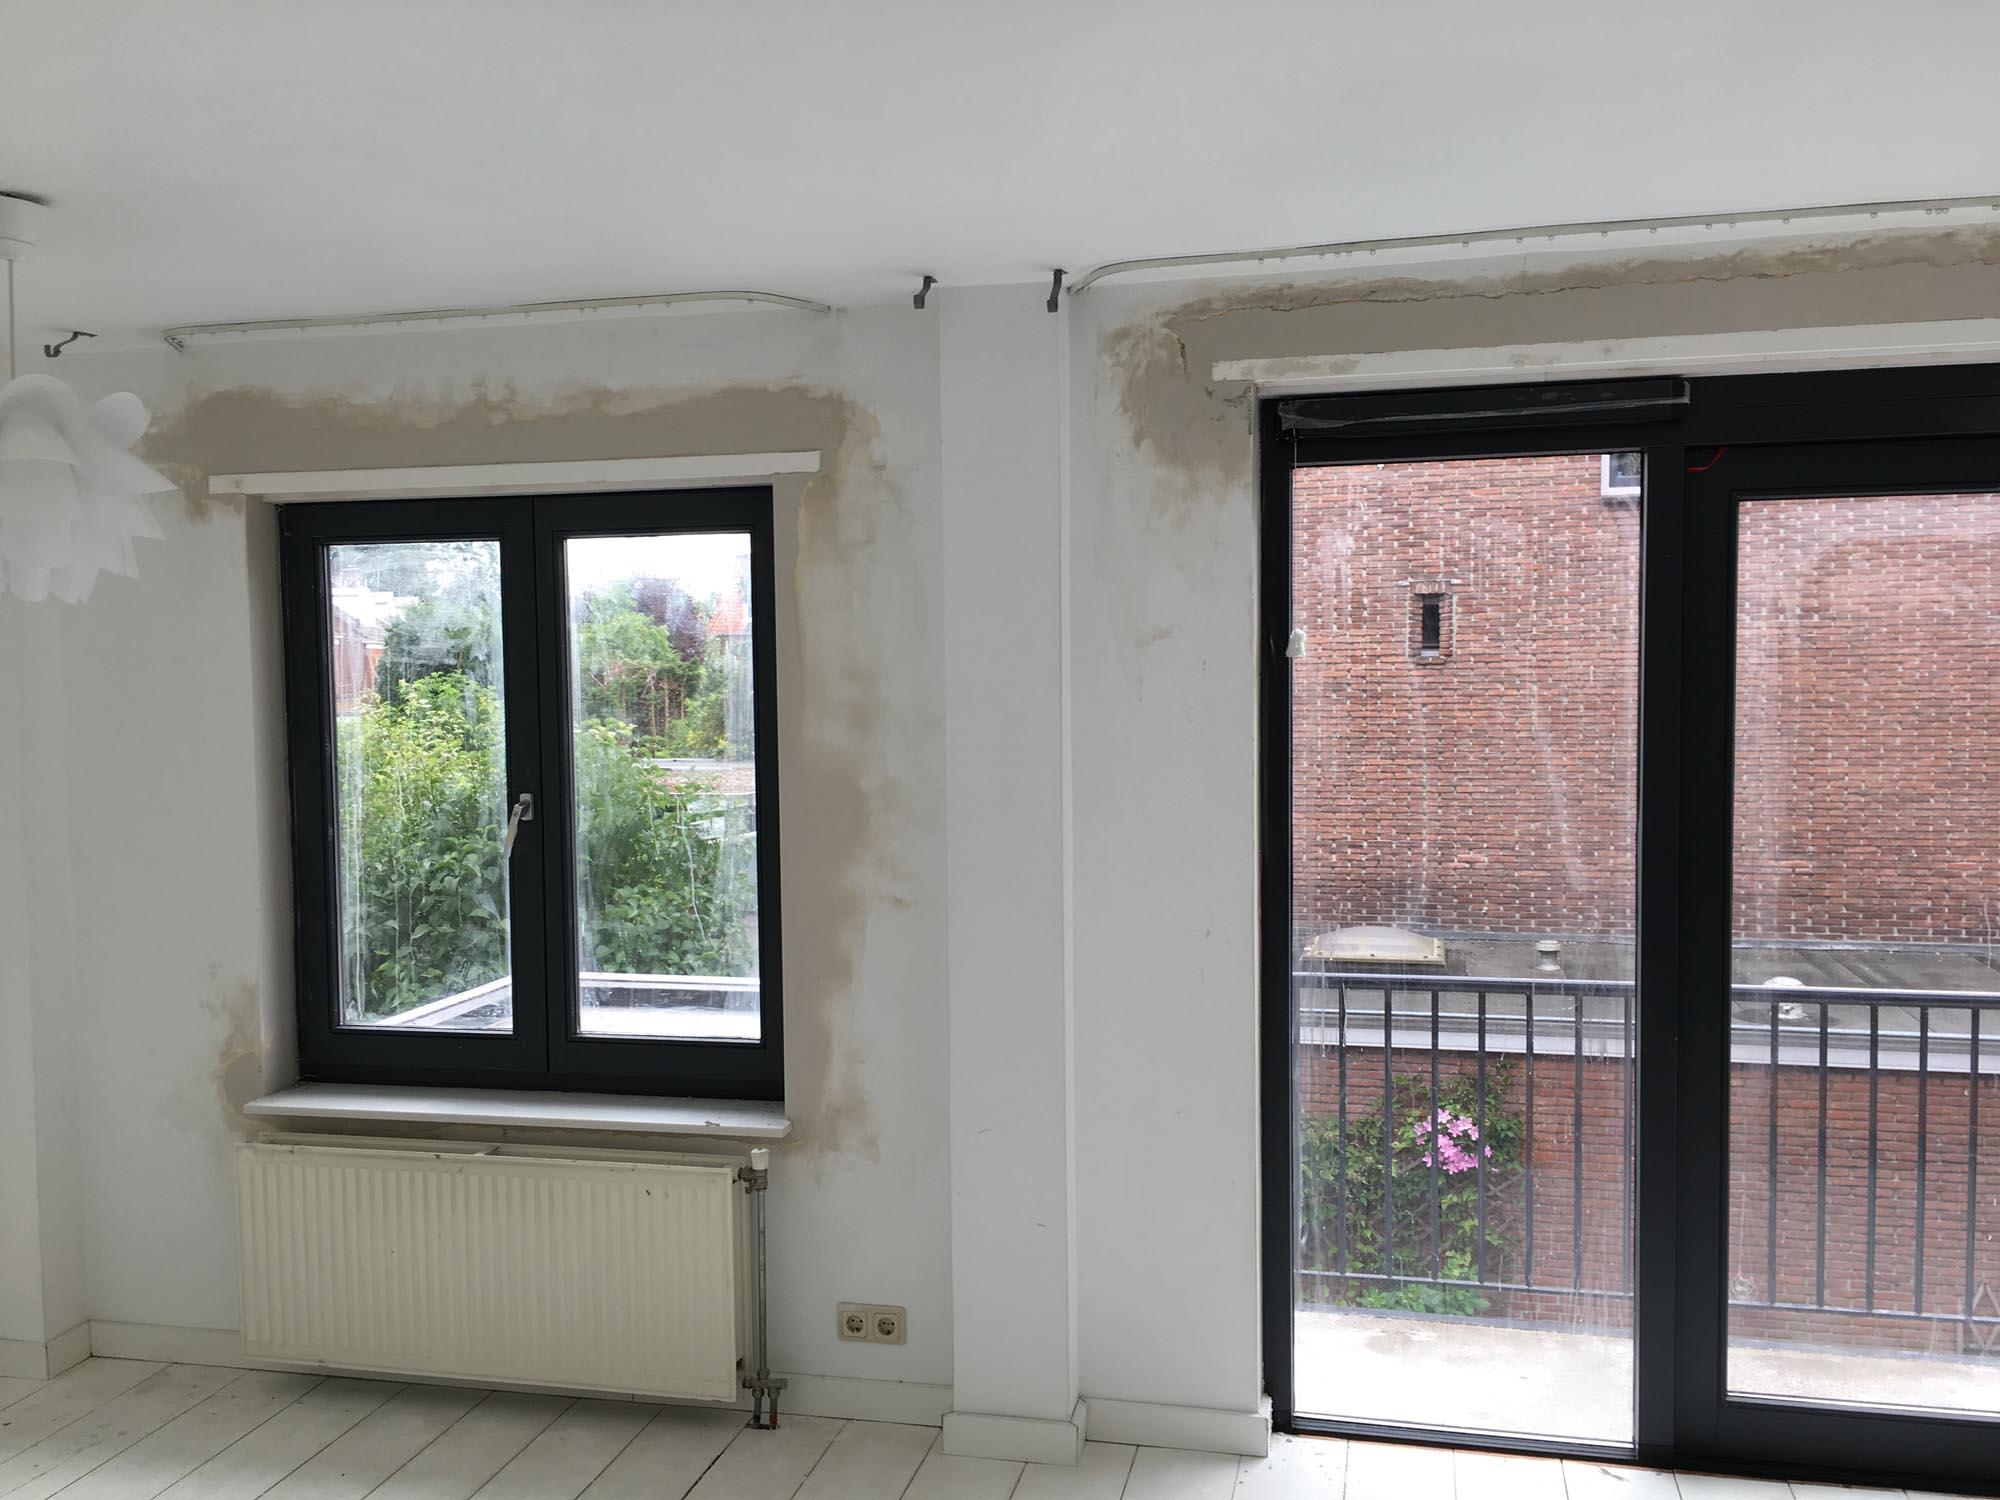 Wanden en plafonds q bouw bouwbedrijf for Wanden nieuwbouwwoning afwerken